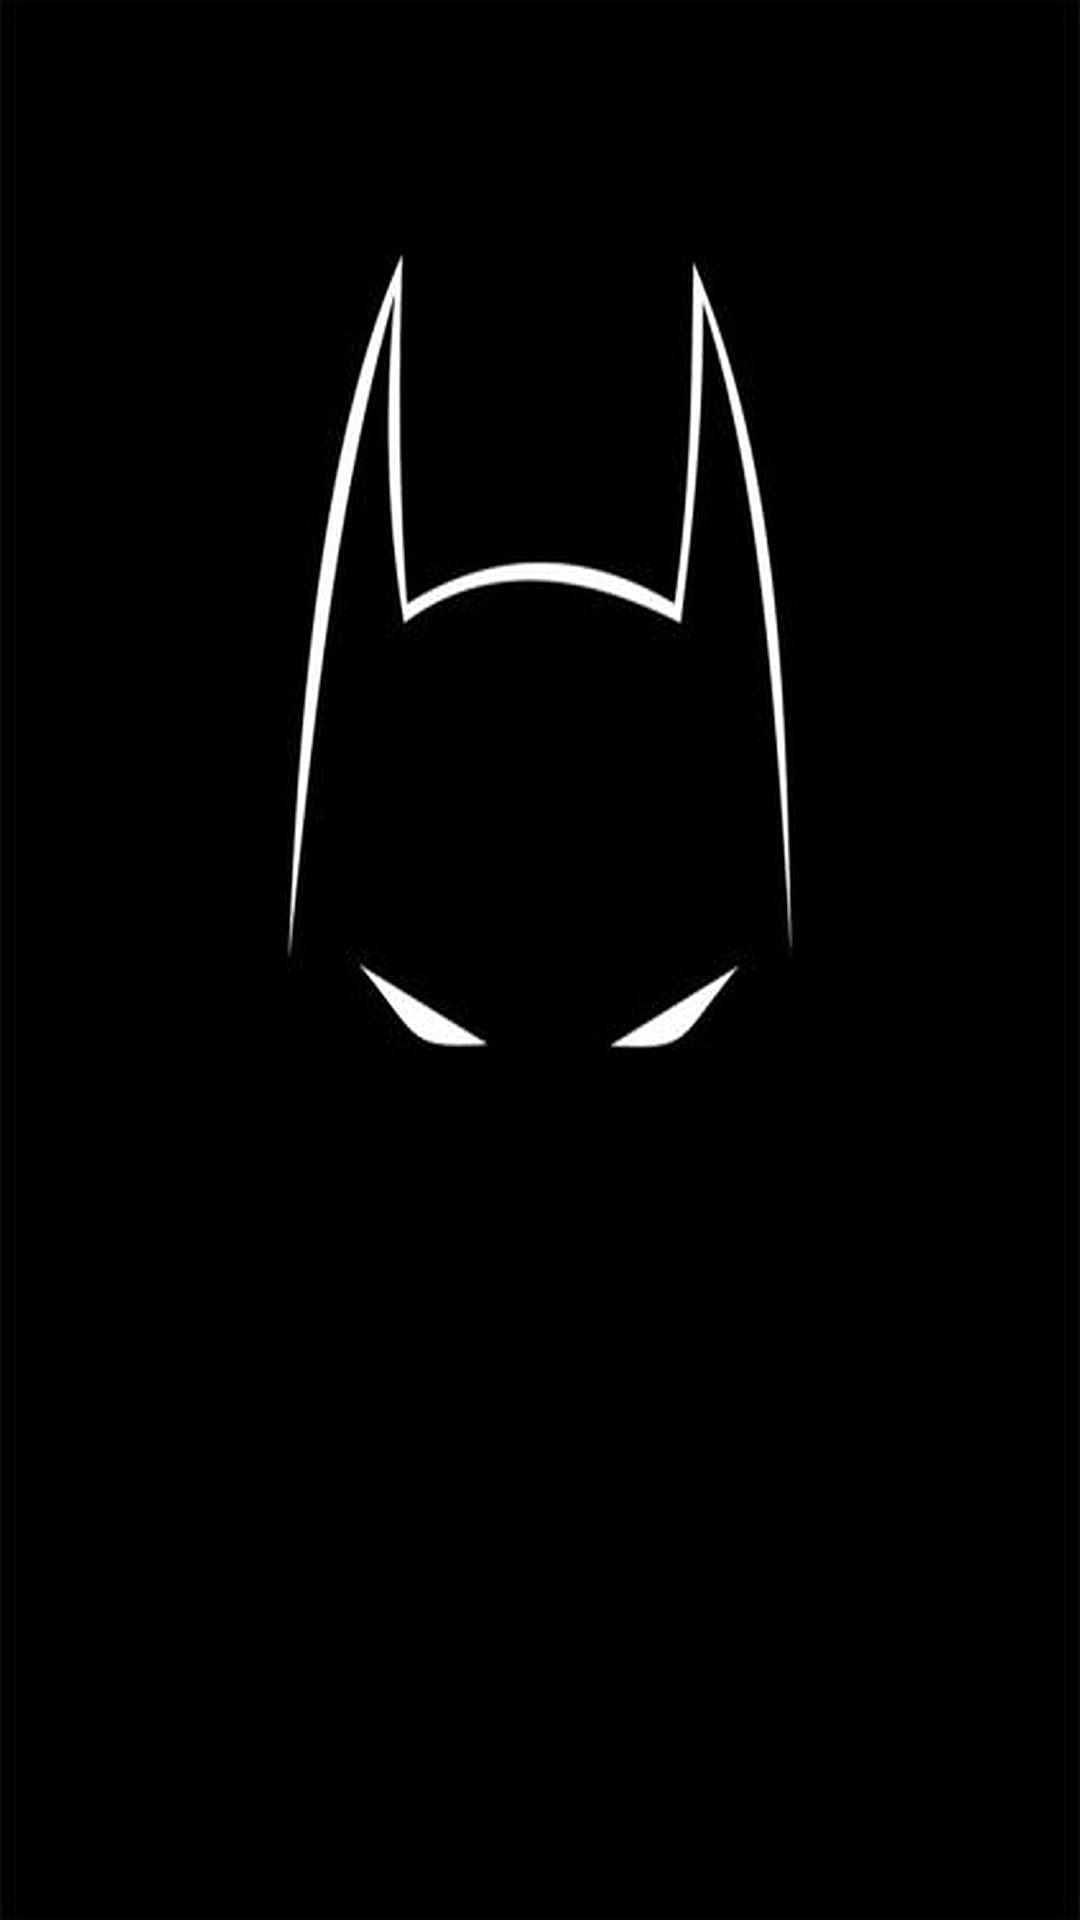 Batman Wallpaper HD download free | HD Wallpapers | Pinterest | Dark  knight, Wallpaper and Knight